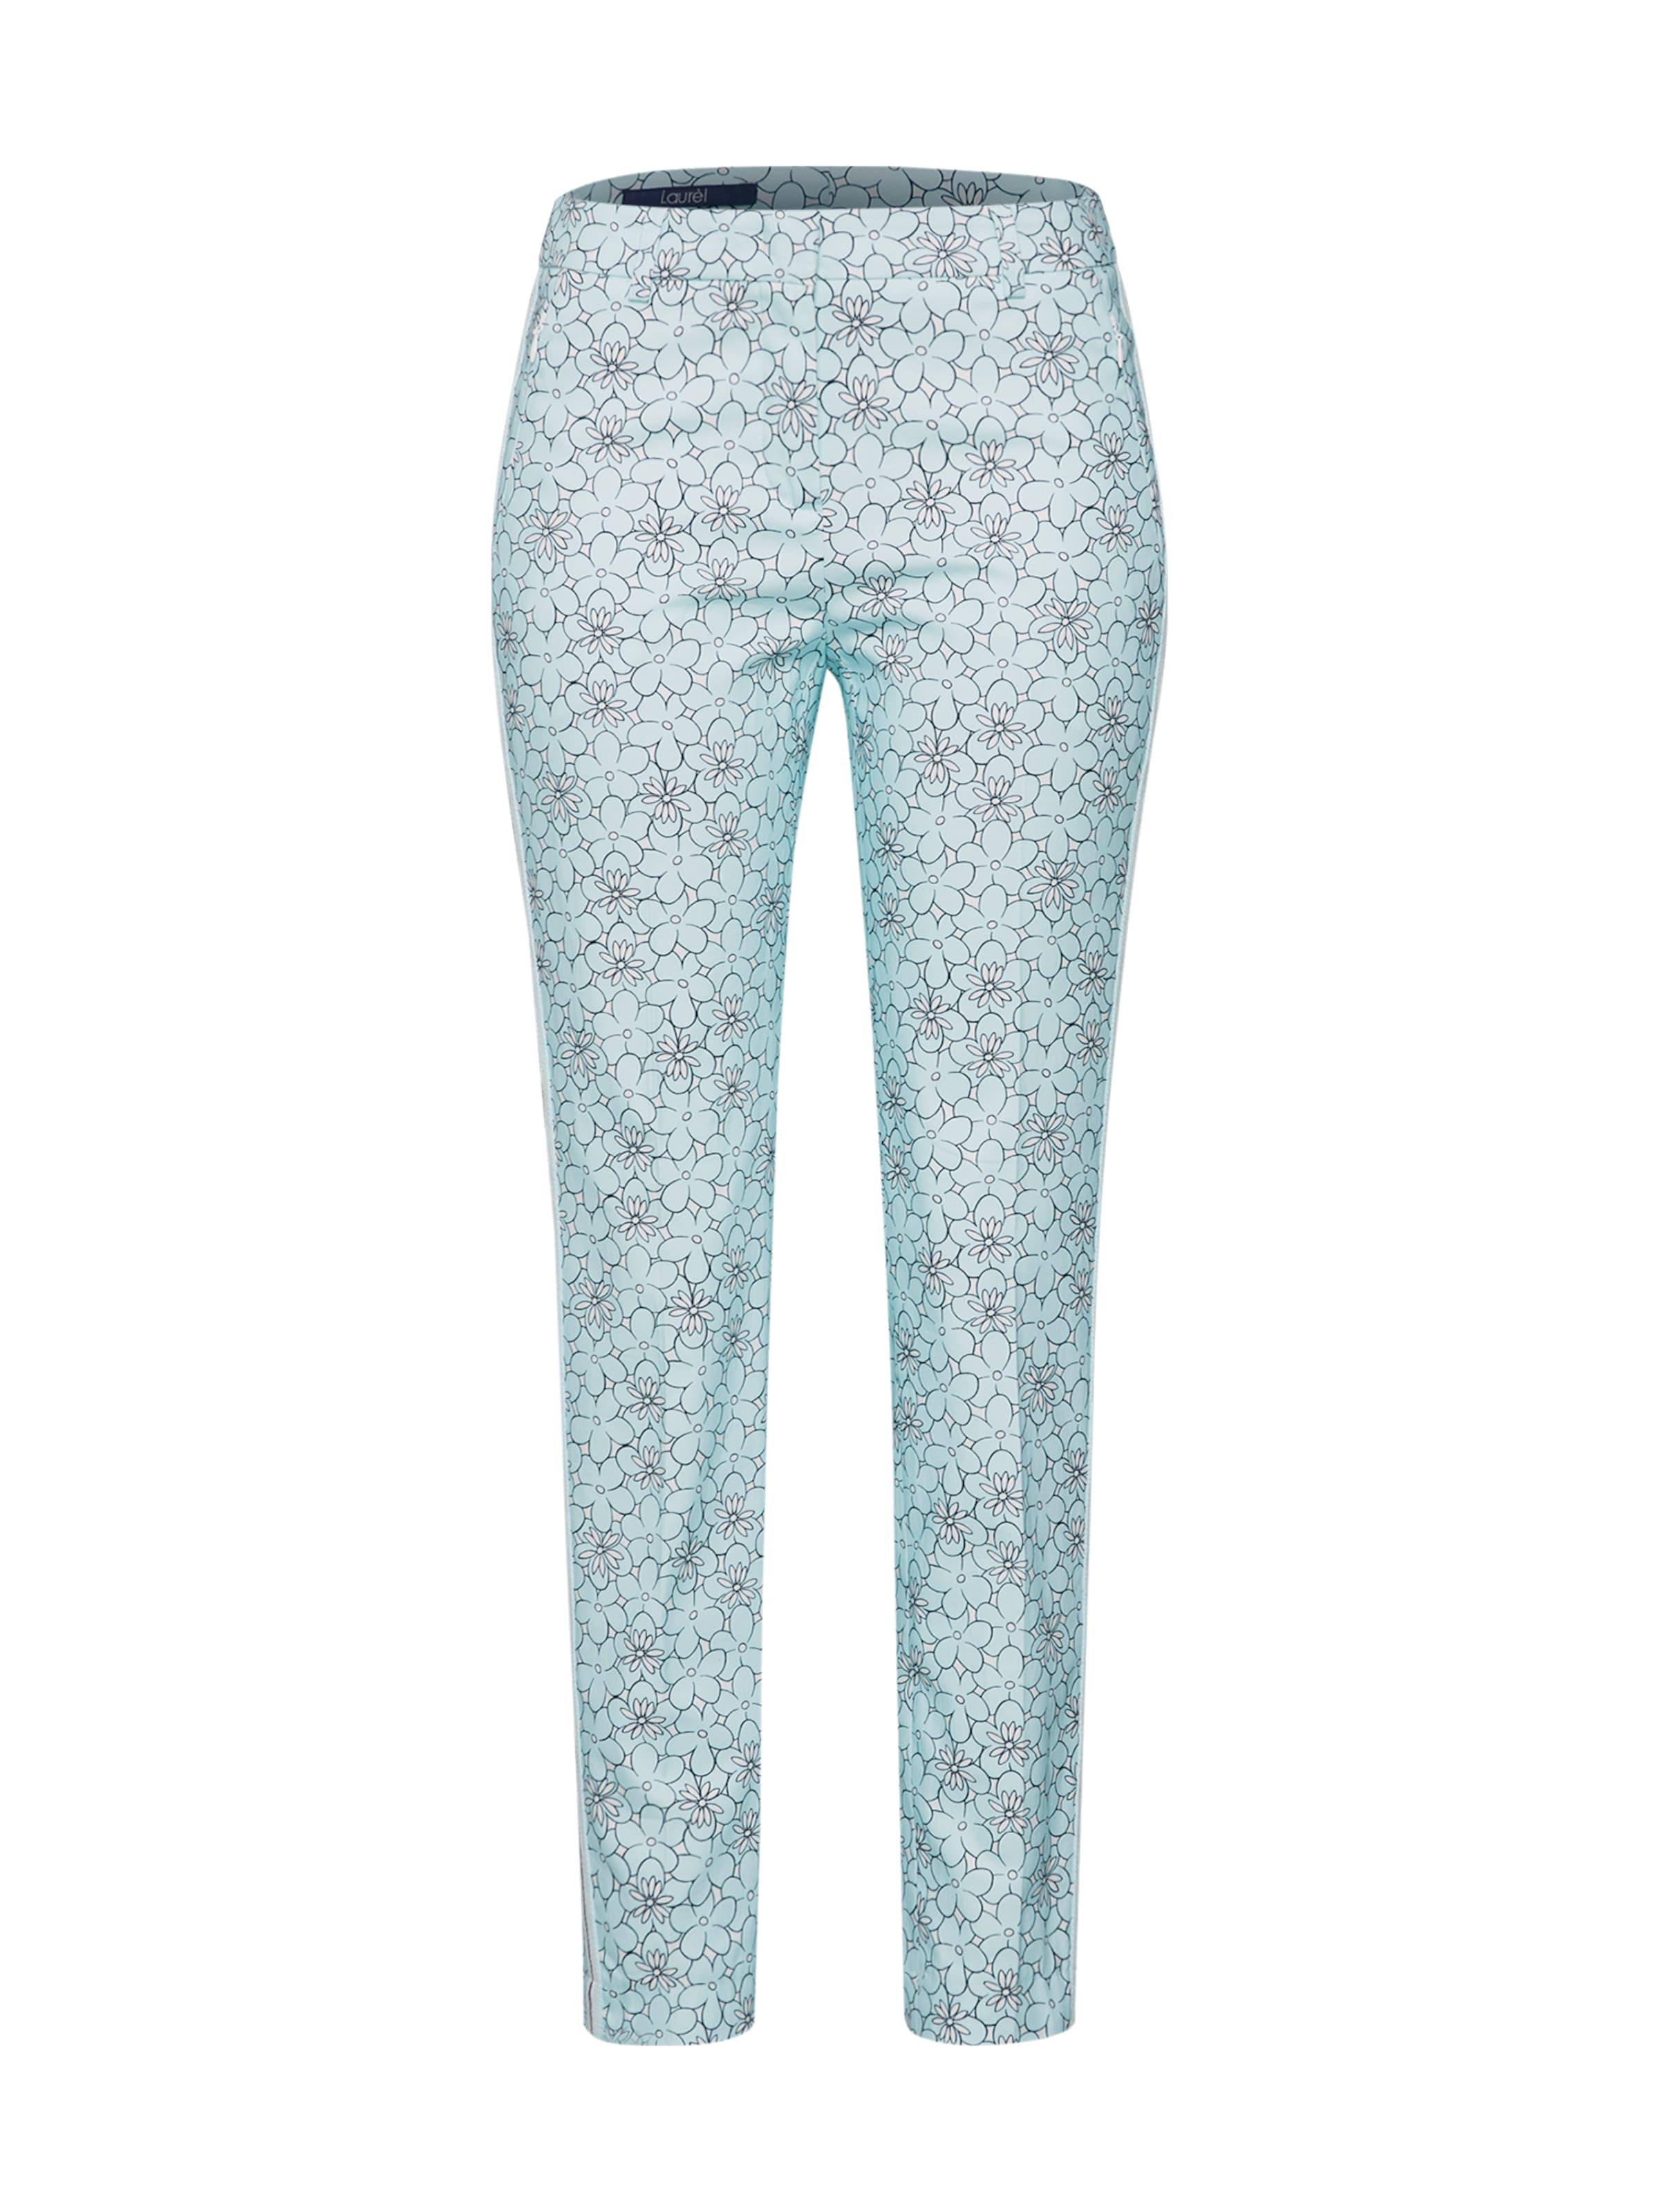 Laurel En Bleu Pantalon Clair '81050' pwqp7r